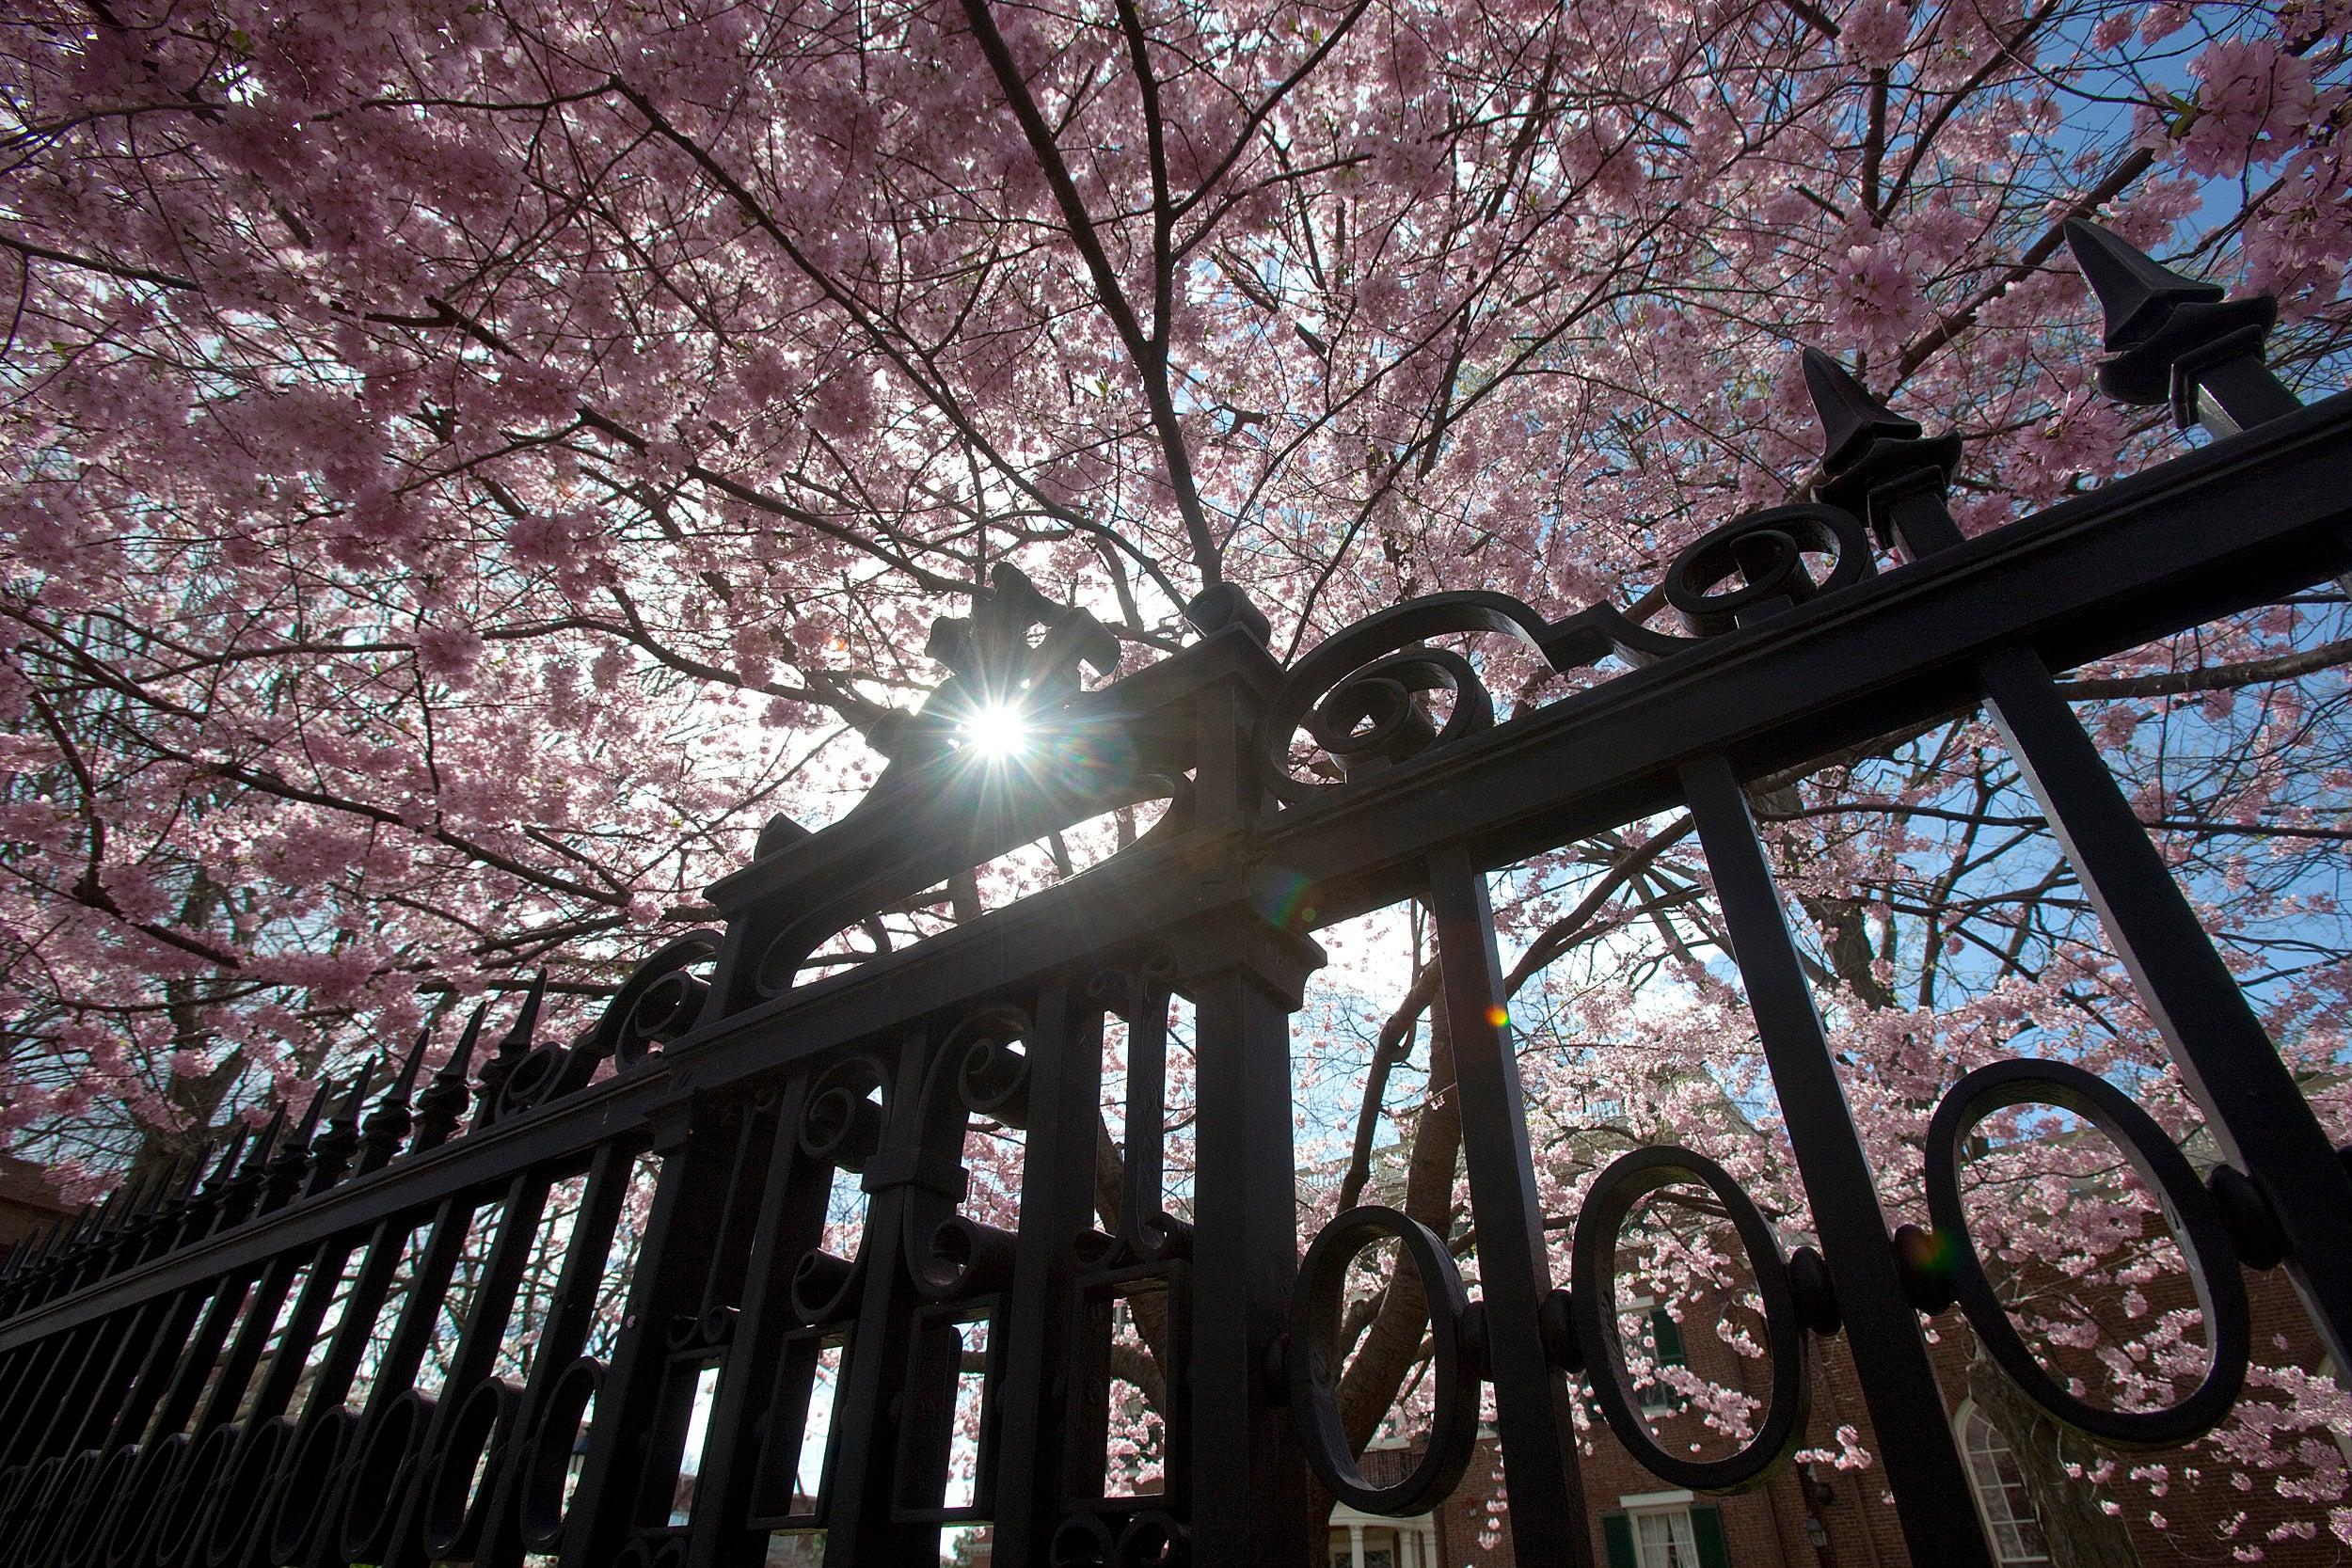 Cherry tree blossoms.